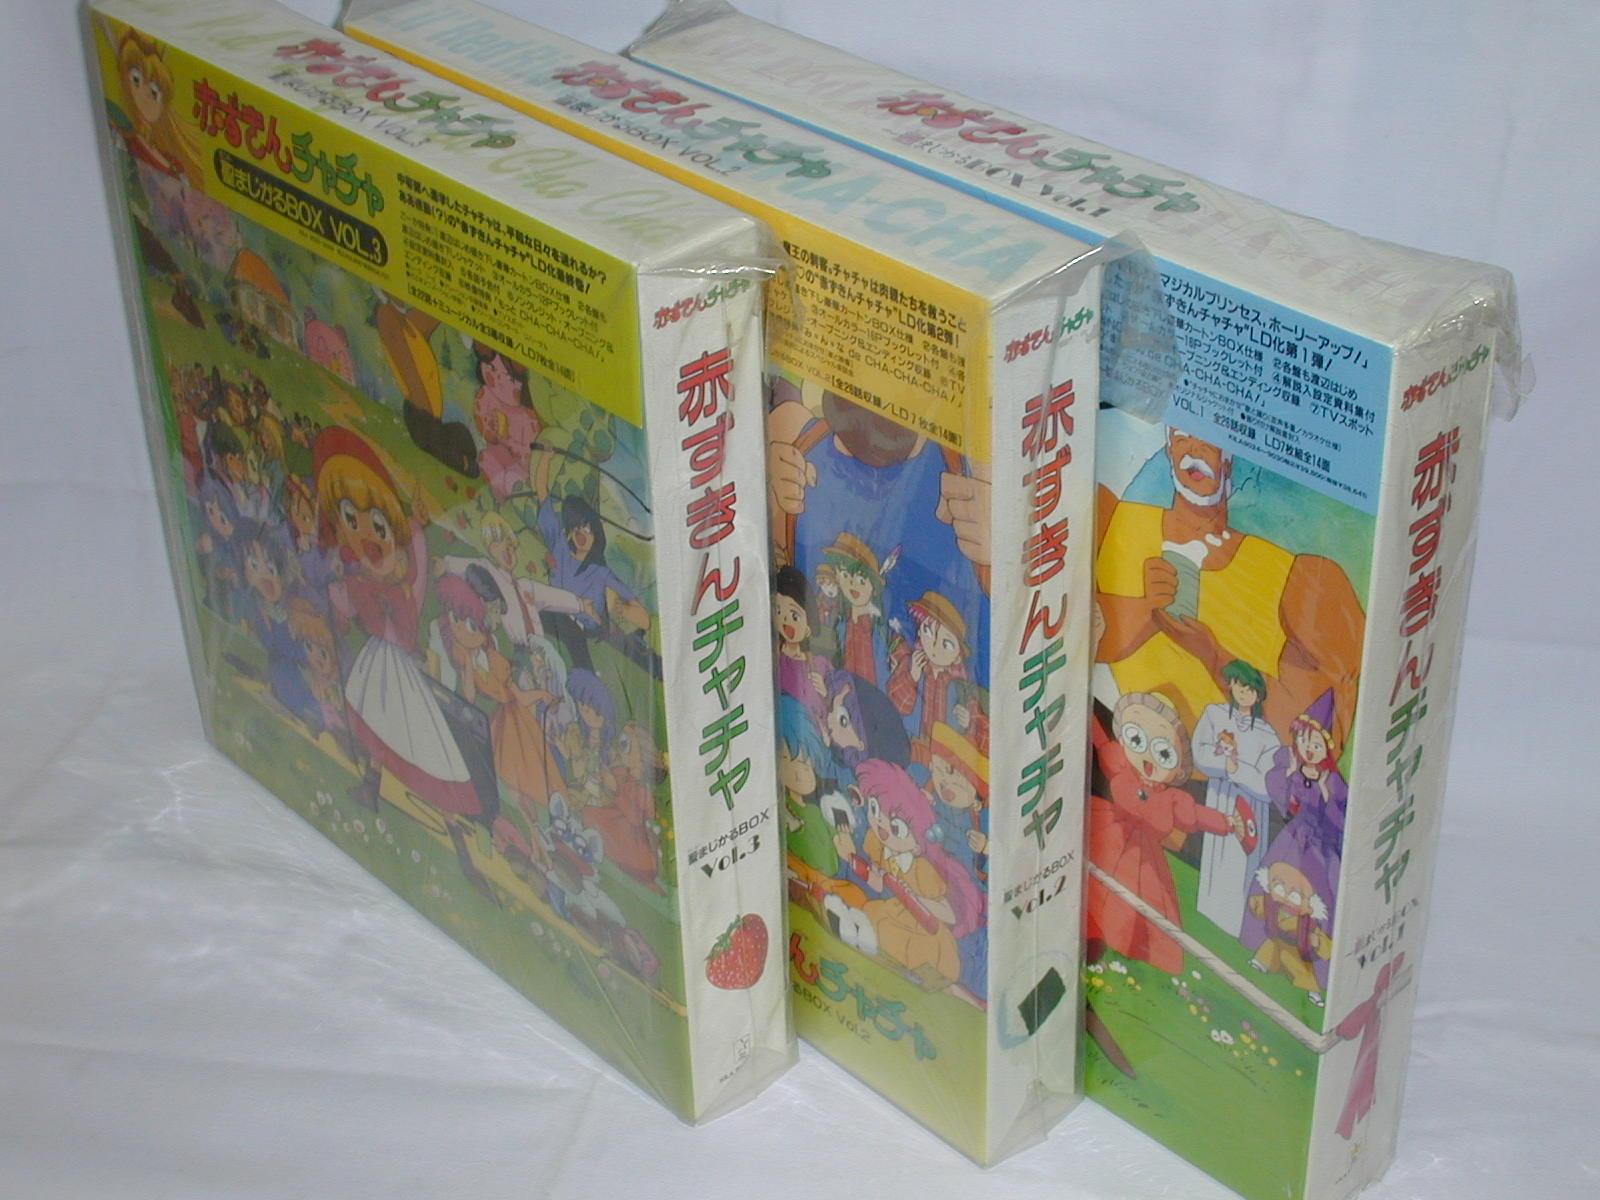 (LD:レーザーディスク)赤ずきんチャチャ Vol.1〜3 全3BOXセット【中古】